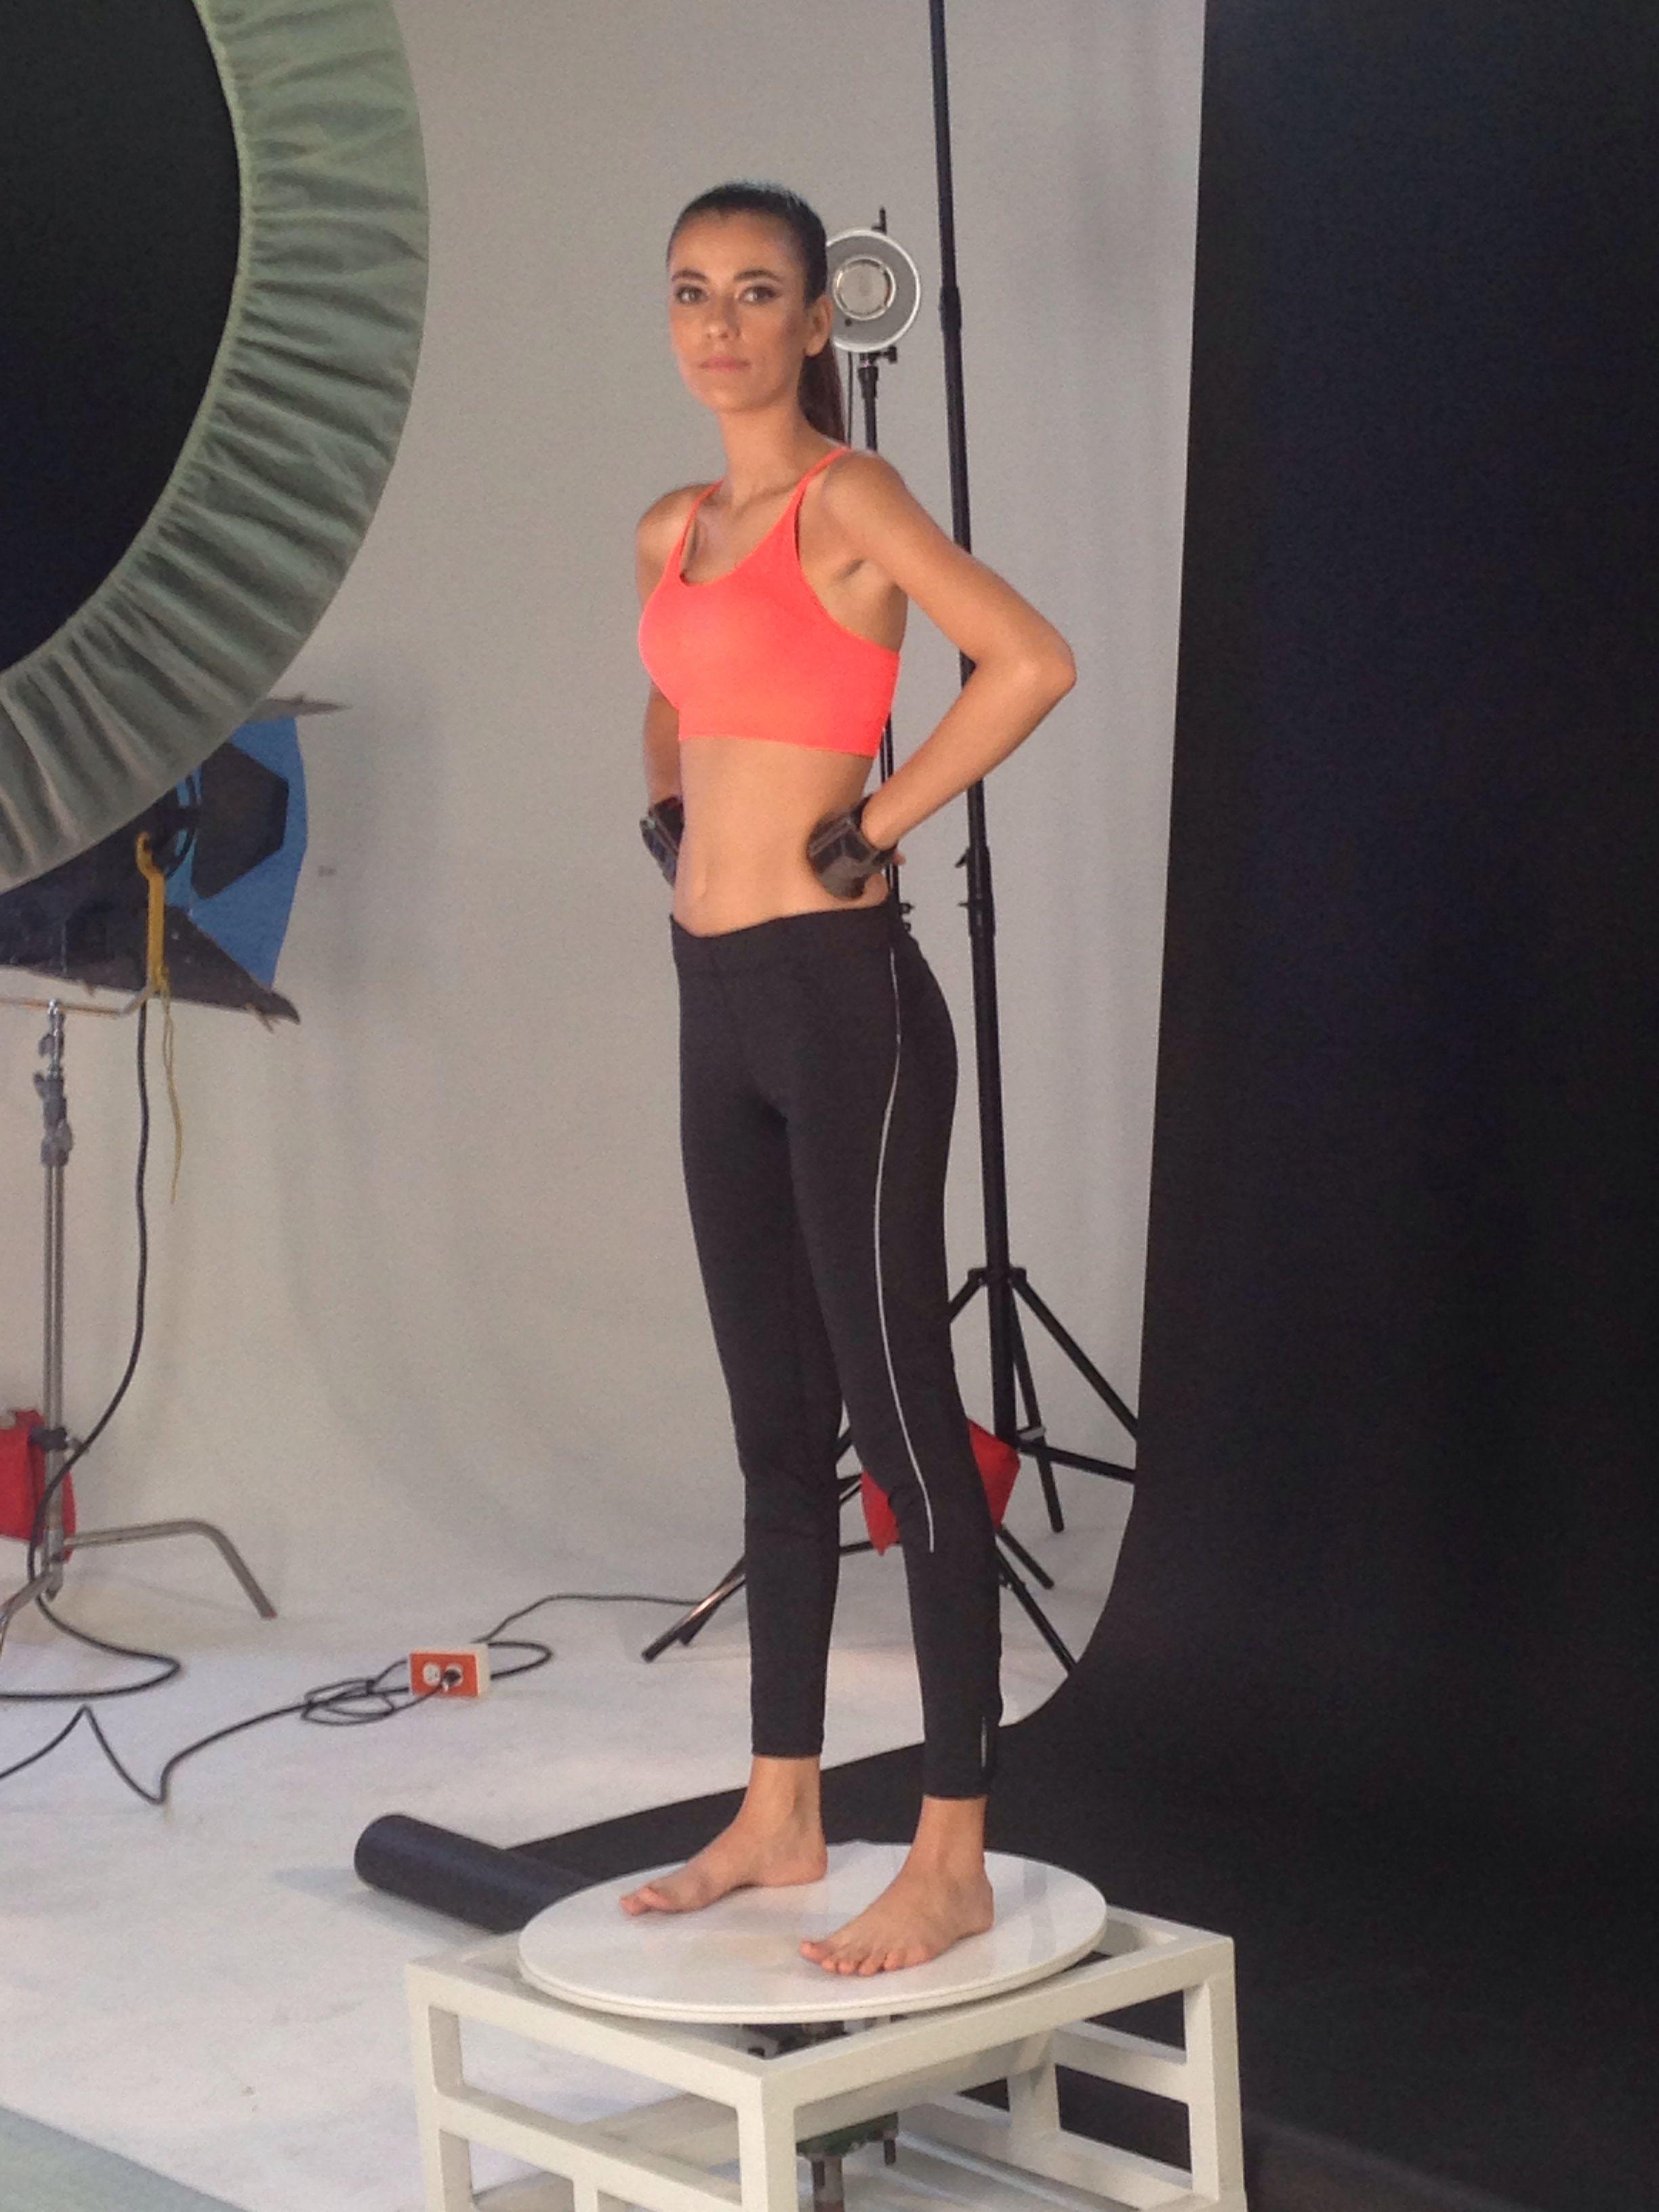 Marly Velasquez nudes (26 photo) Gallery, Facebook, bra